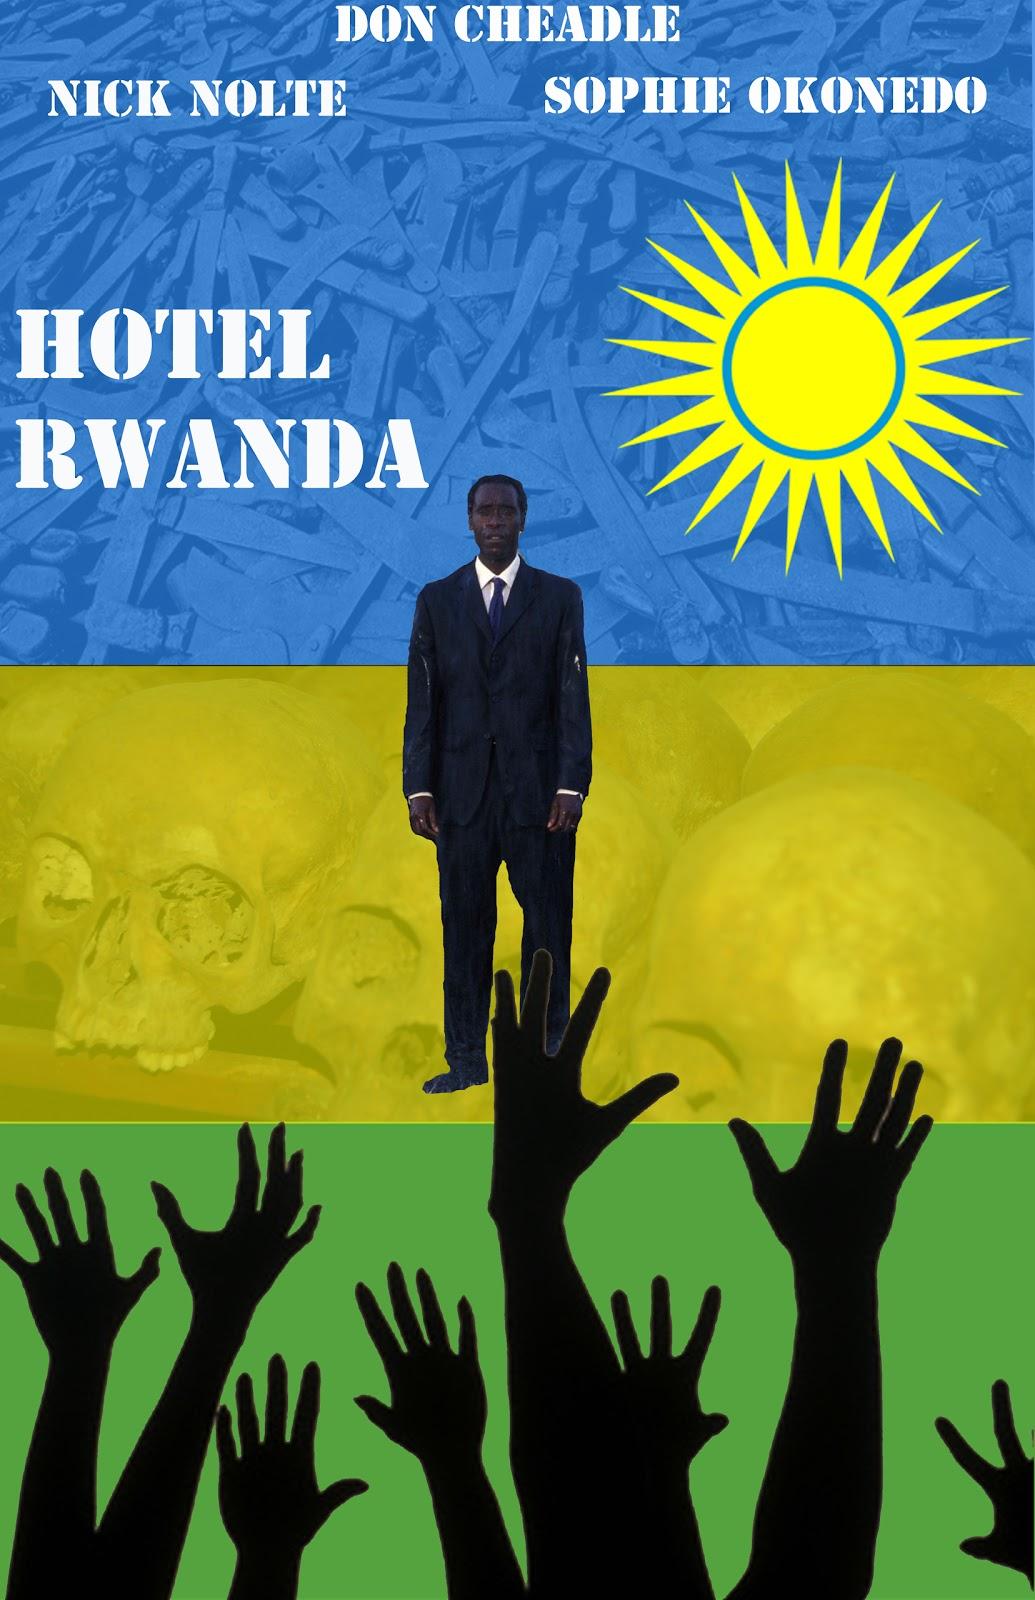 http://1.bp.blogspot.com/-5MJr42HLdtM/T6u7g3Q0ZkI/AAAAAAAAAEg/ECK9dlQF4Nc/s1600/Hotel%2BRwanda%2BMovie%2BPoster.jpg